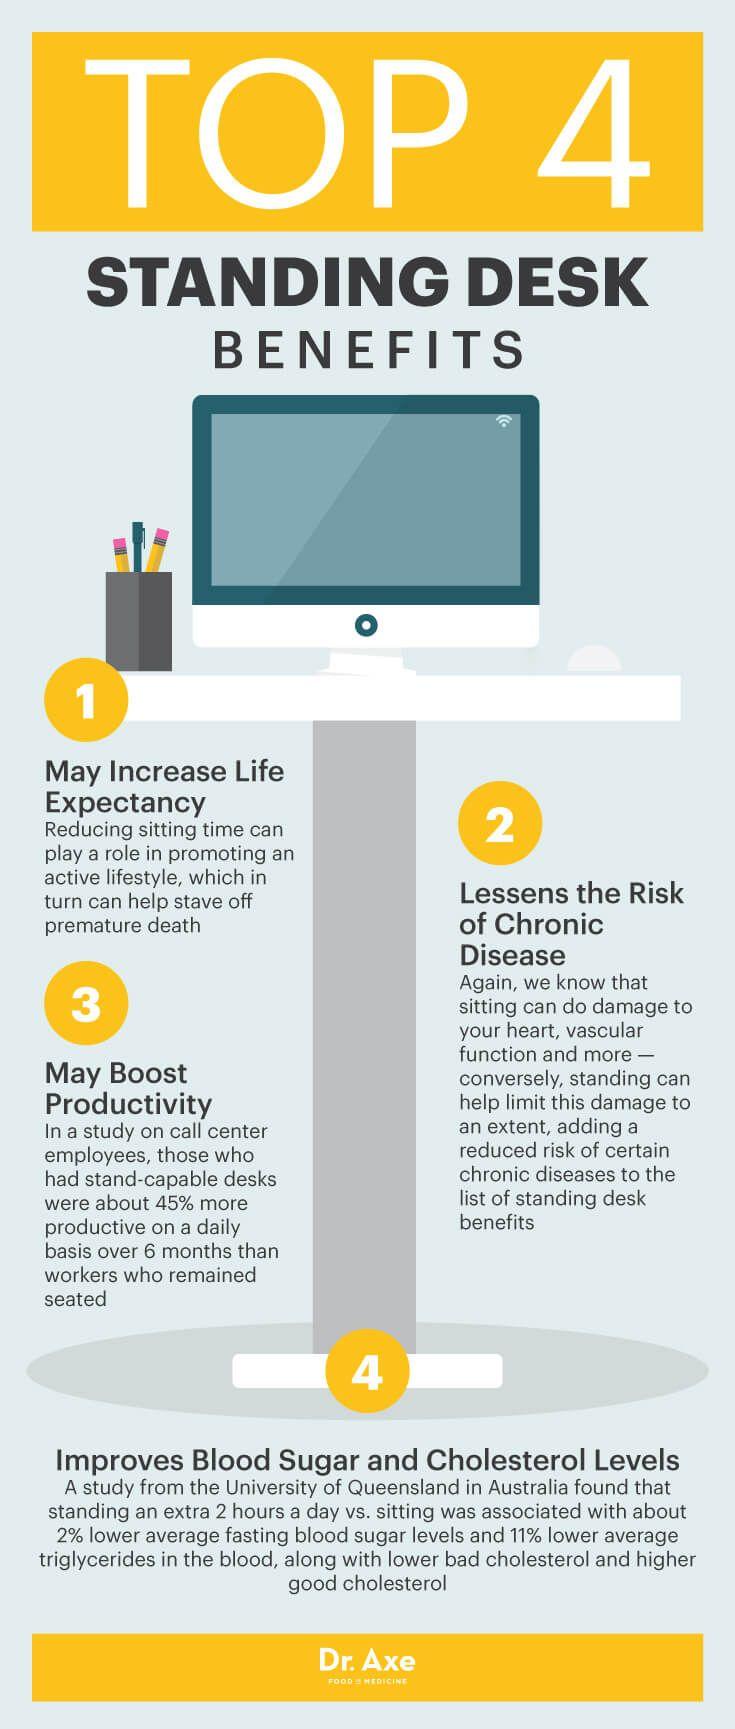 Top four standing desk benefits - Dr. Axe http://www.DrAxe.com #health #holistic #natural